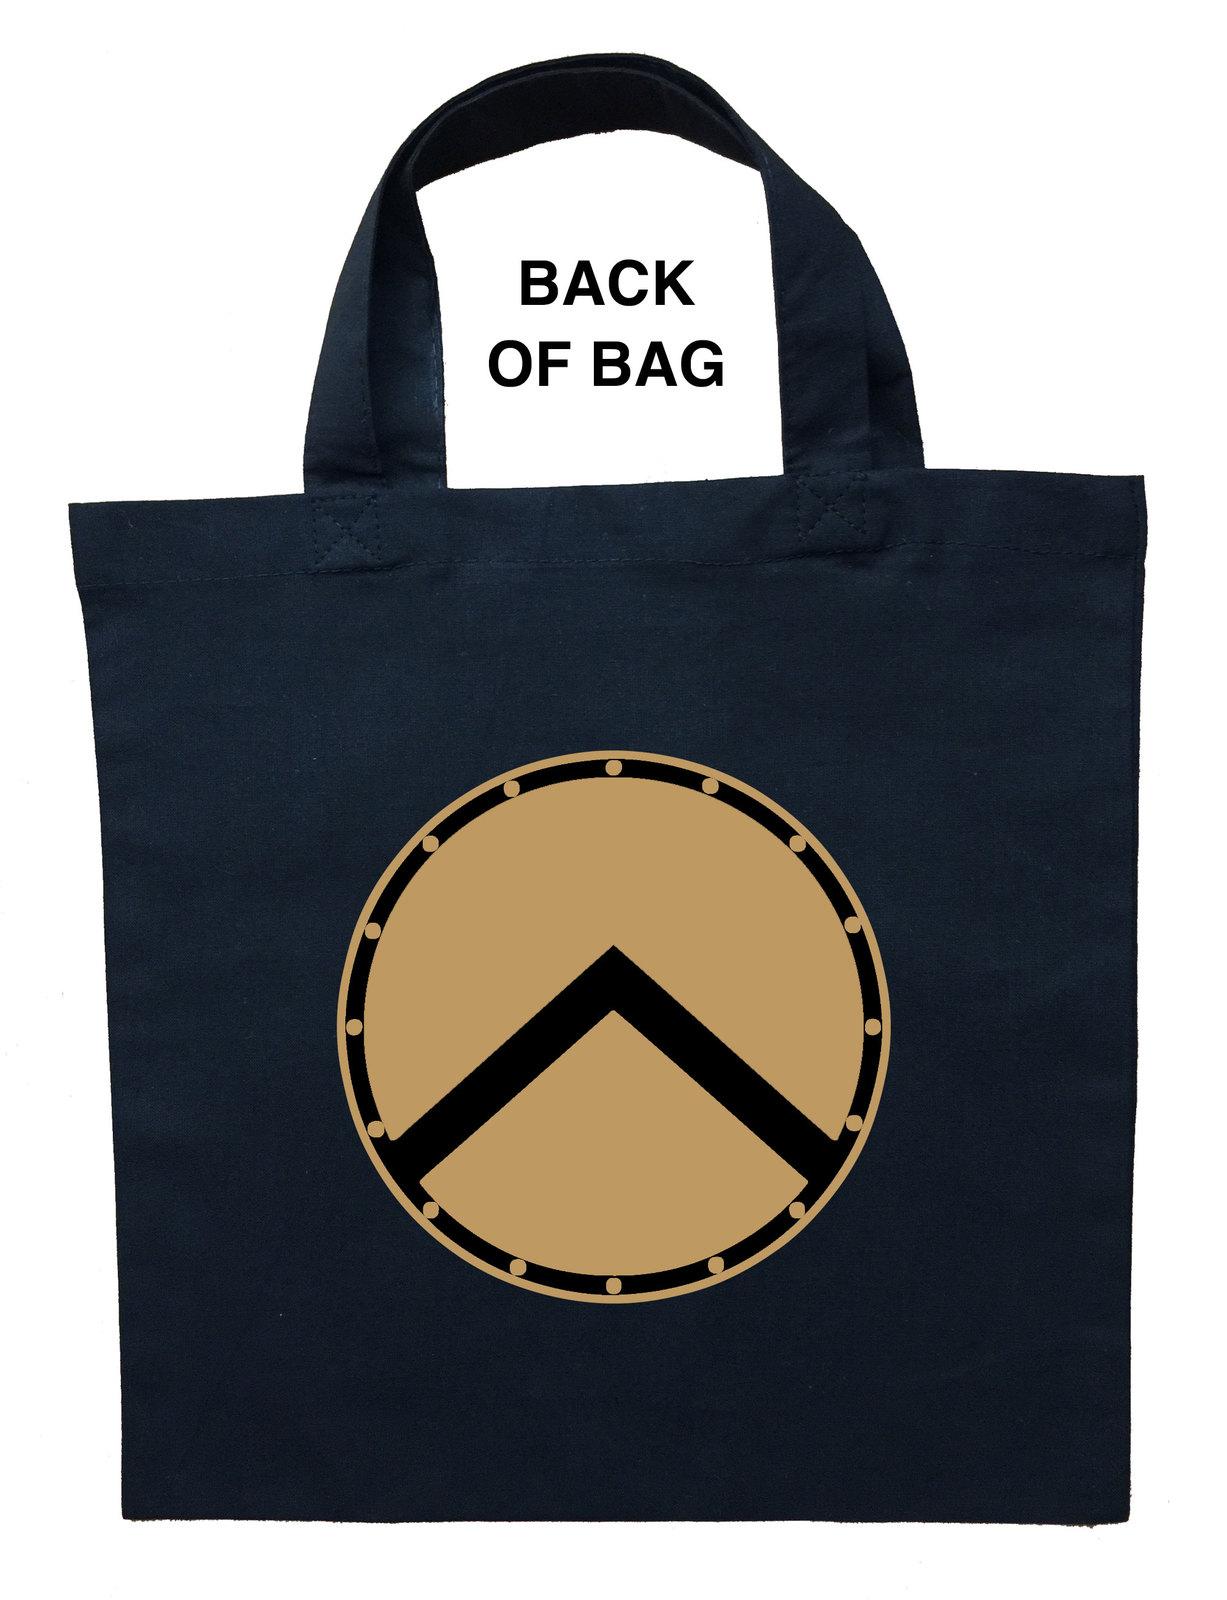 Spartan Trick or Treat Bag, Personalized Spartan Halloween Bag, Spartan Bag